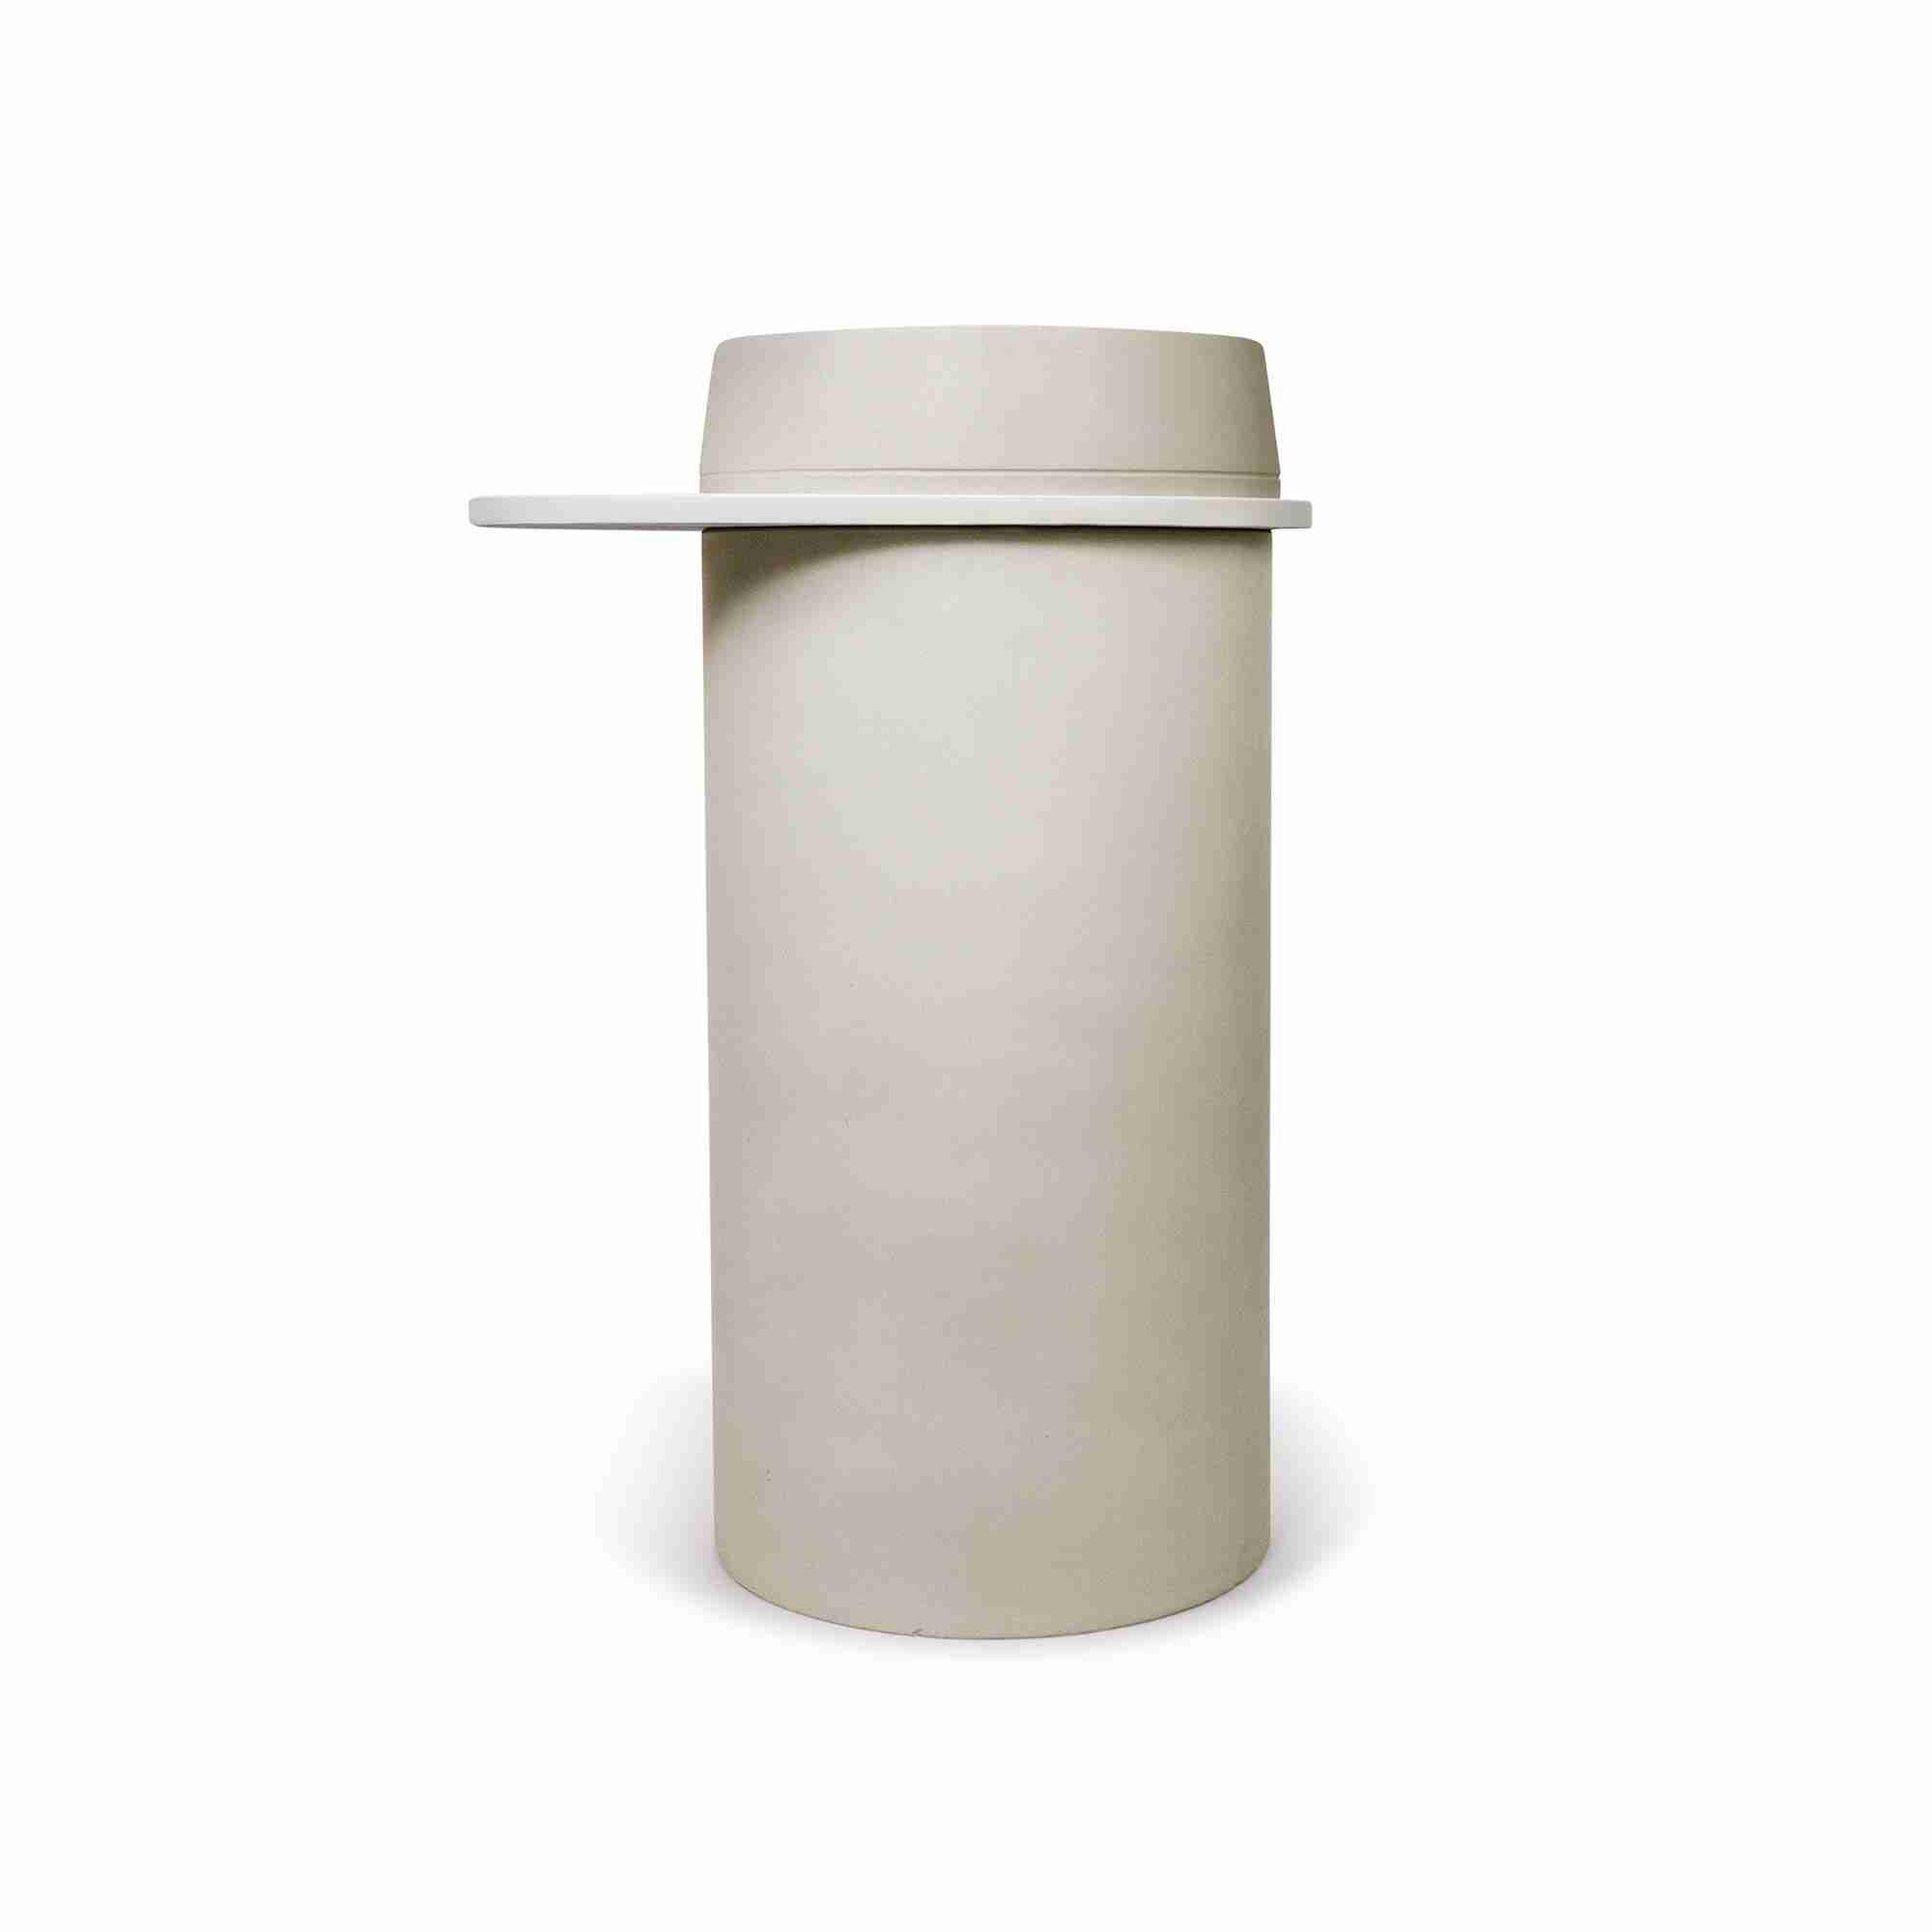 Funl Basin Cylinder 4